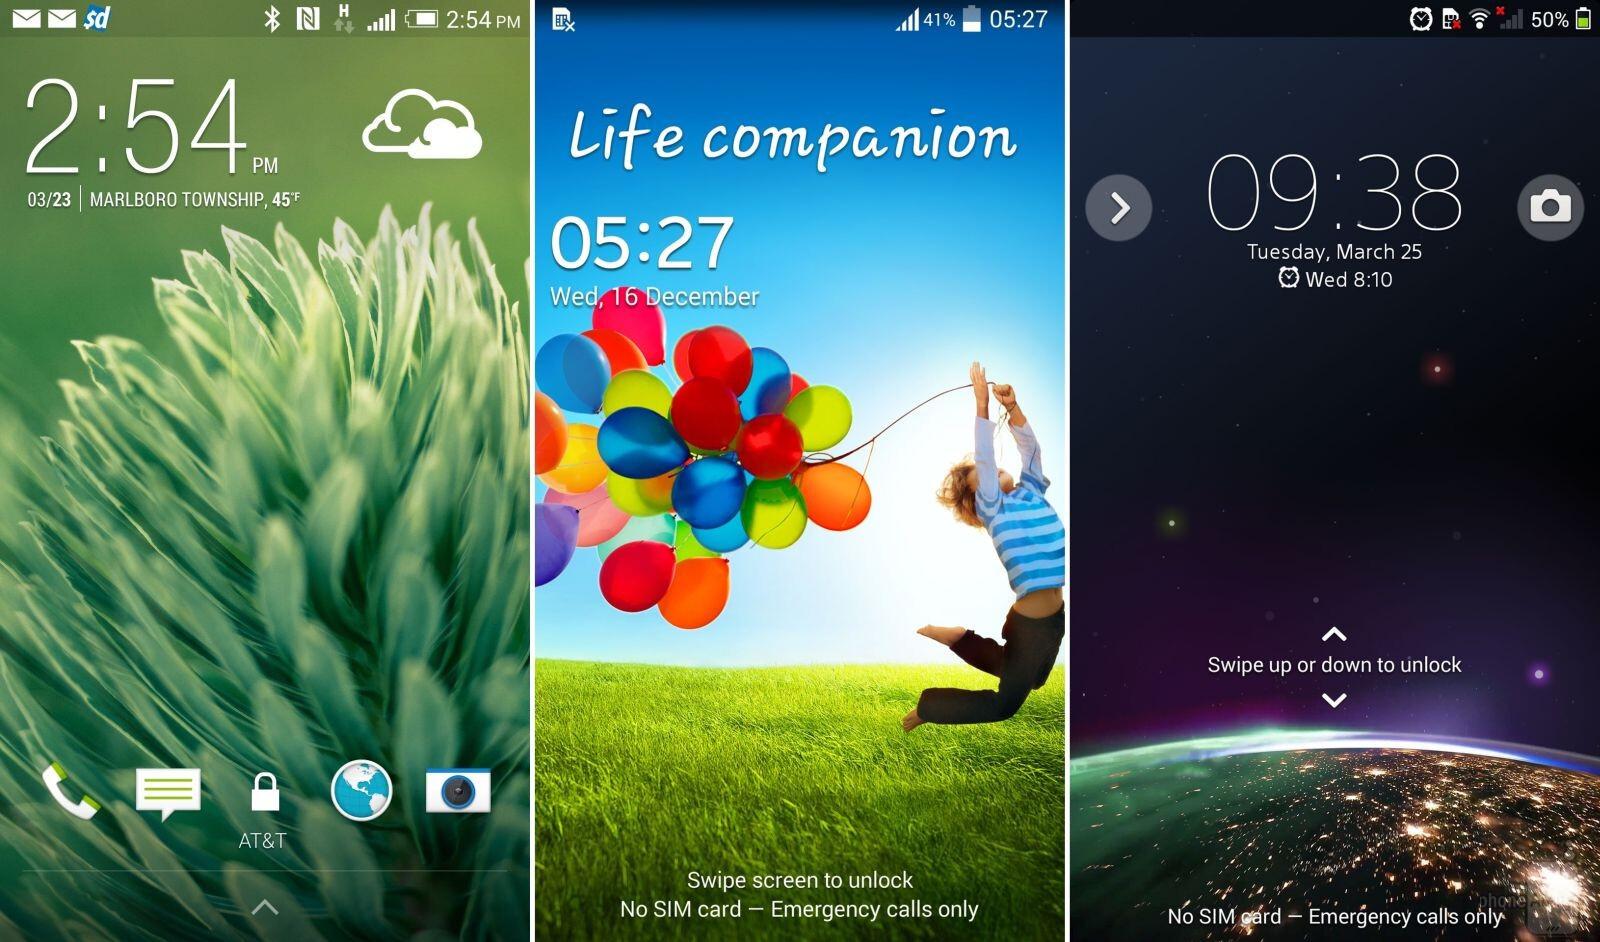 HTC Sense 6 vs Samsung TouchWiz vs Sony Xperia: UI comparison